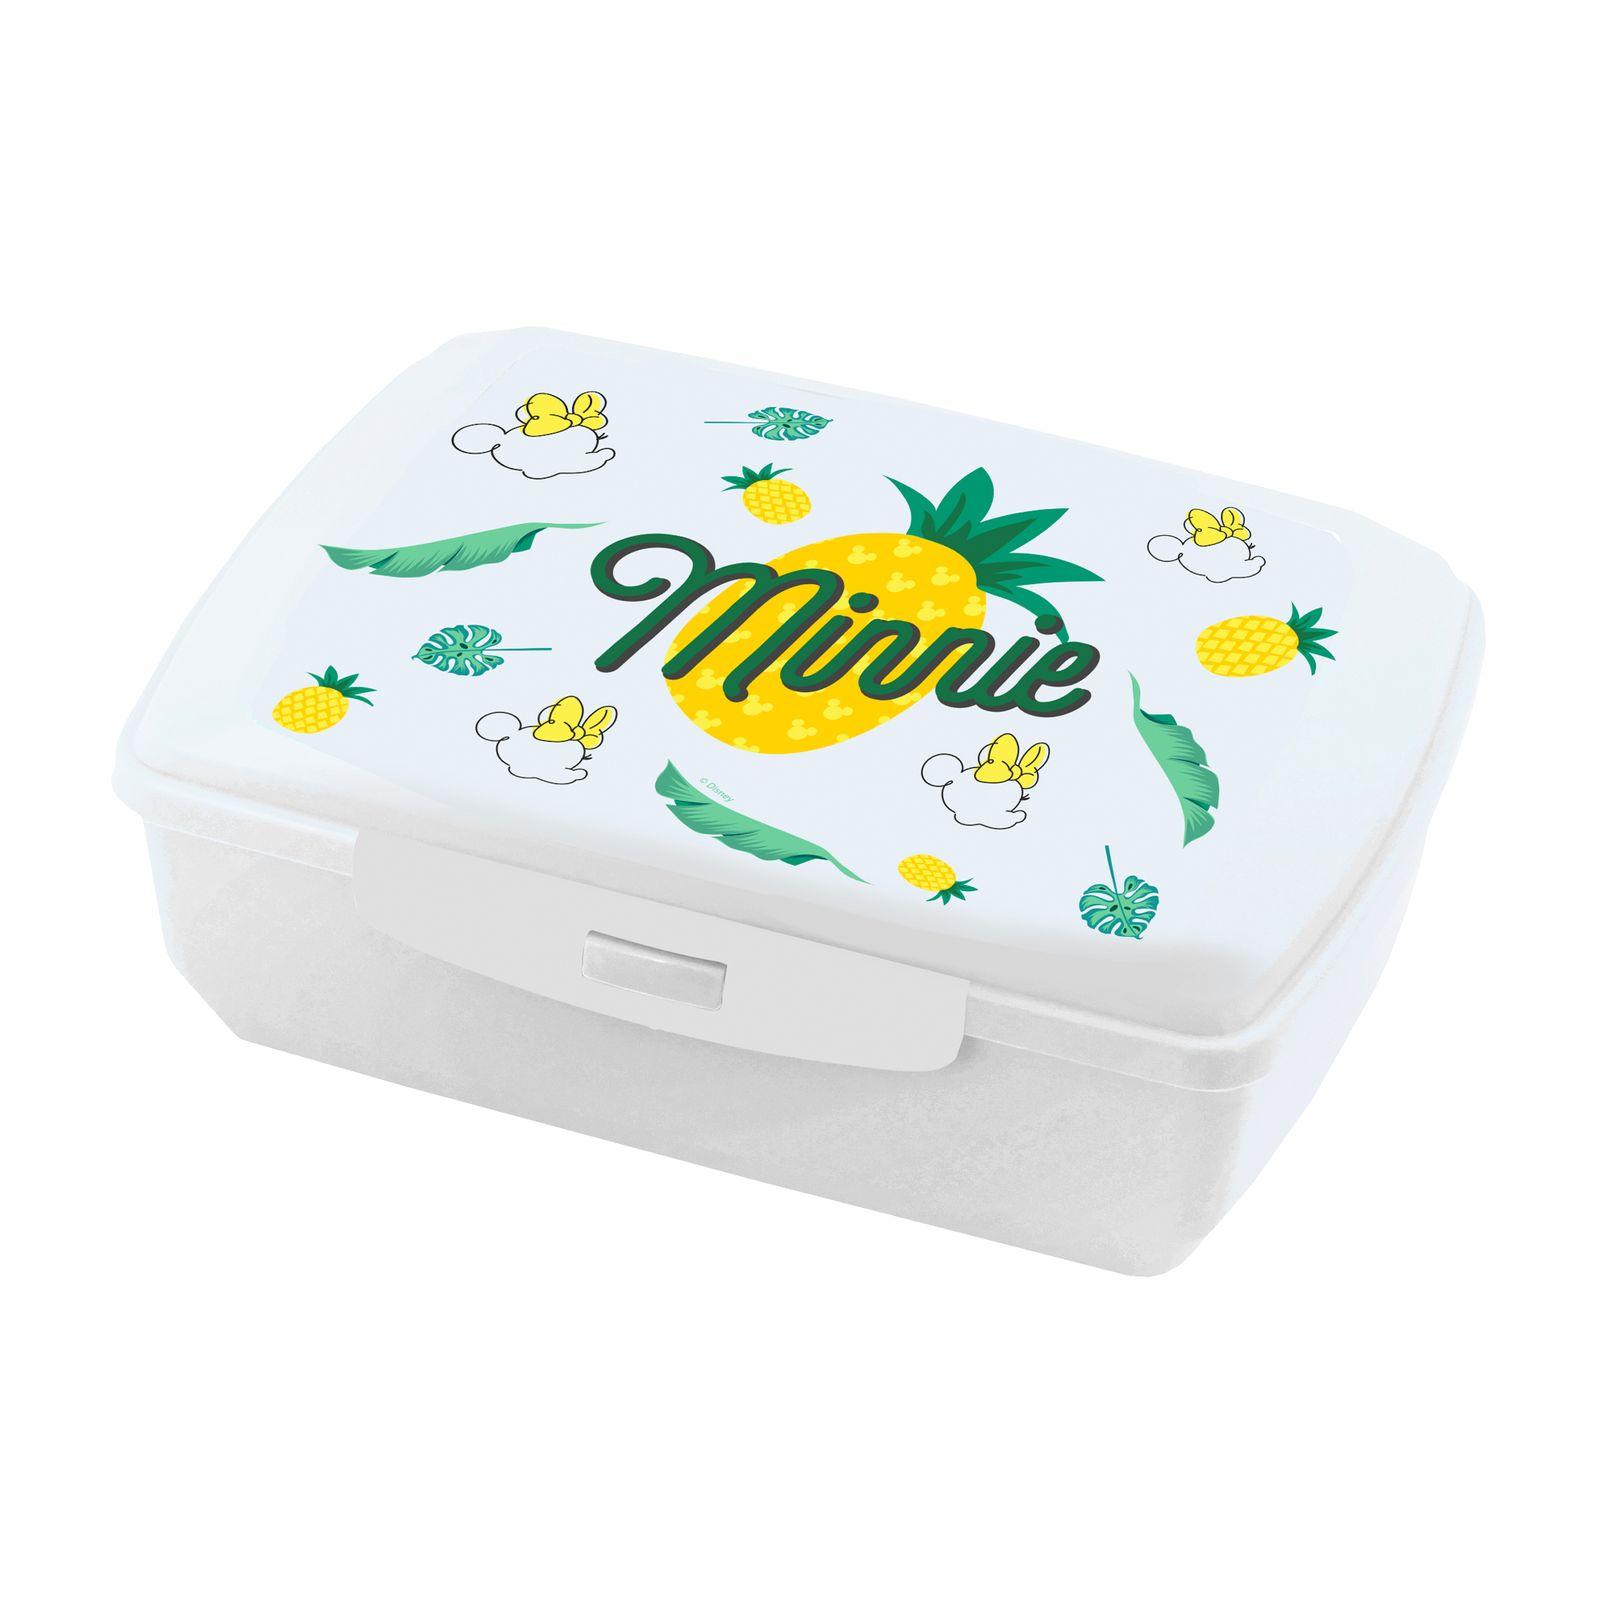 Boîte à goûter Minnie Pineapple 20 x 13 cm DISNEY / AMBITION